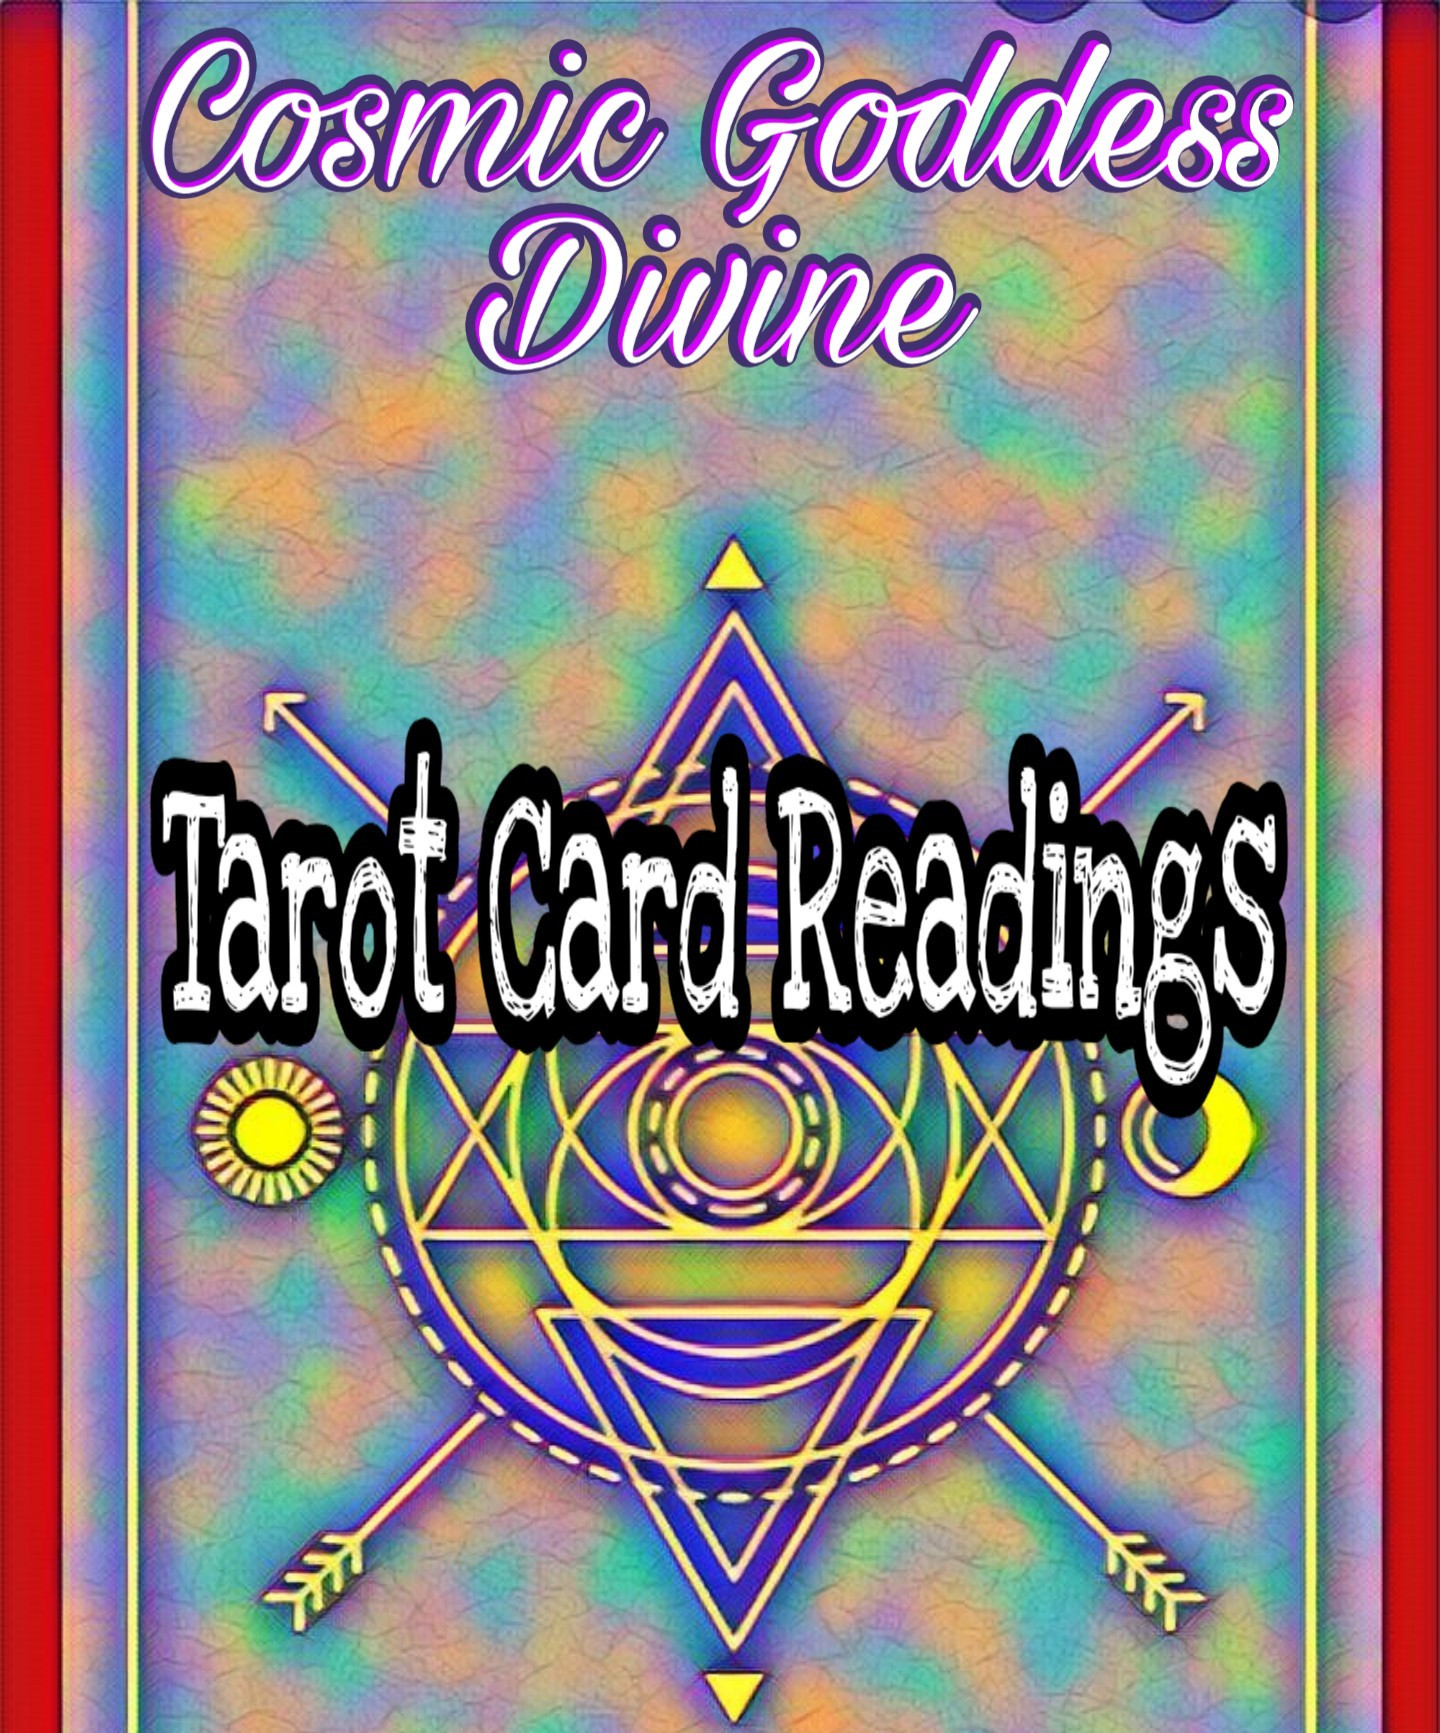 Cosmic Goddess Tarot Reading